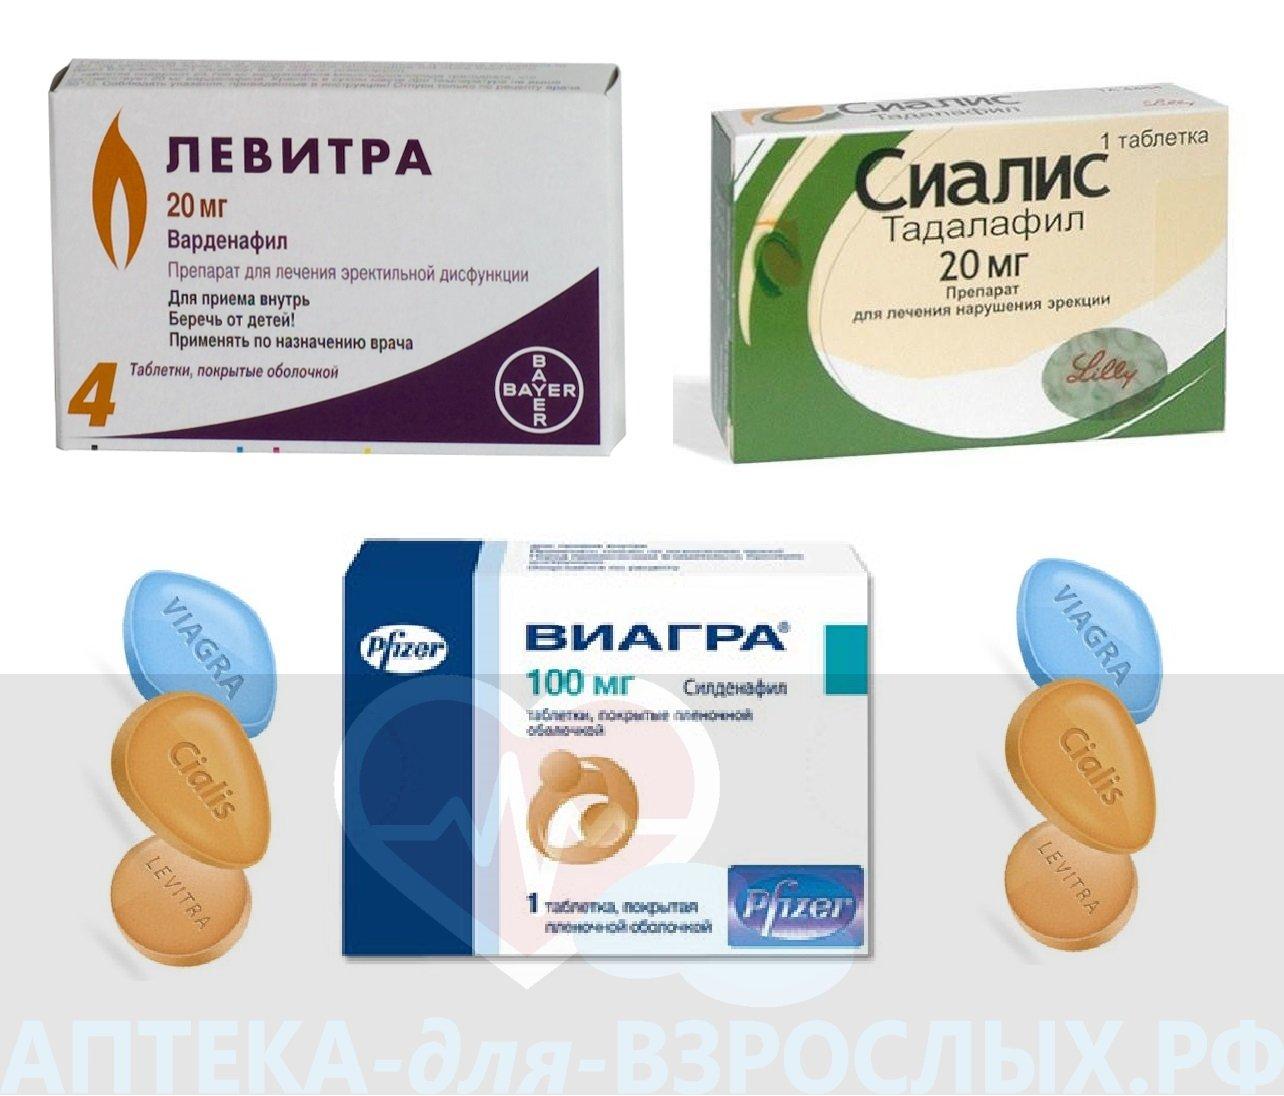 виагра таблетки для мужчин способ применения